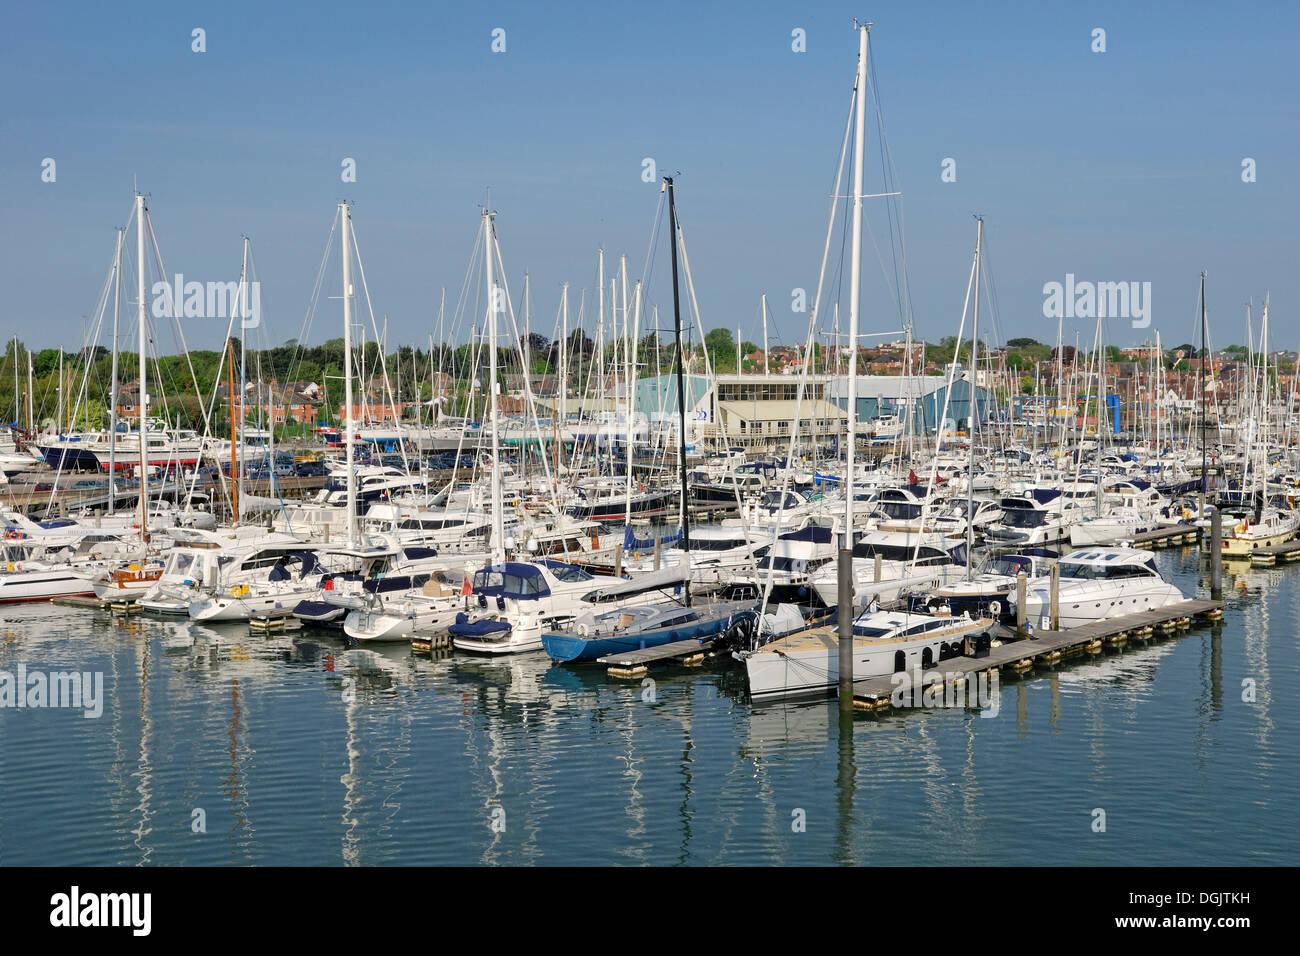 Sailing ships in the port of Lymington, southern England, England, United Kingdom, Europe - Stock Image